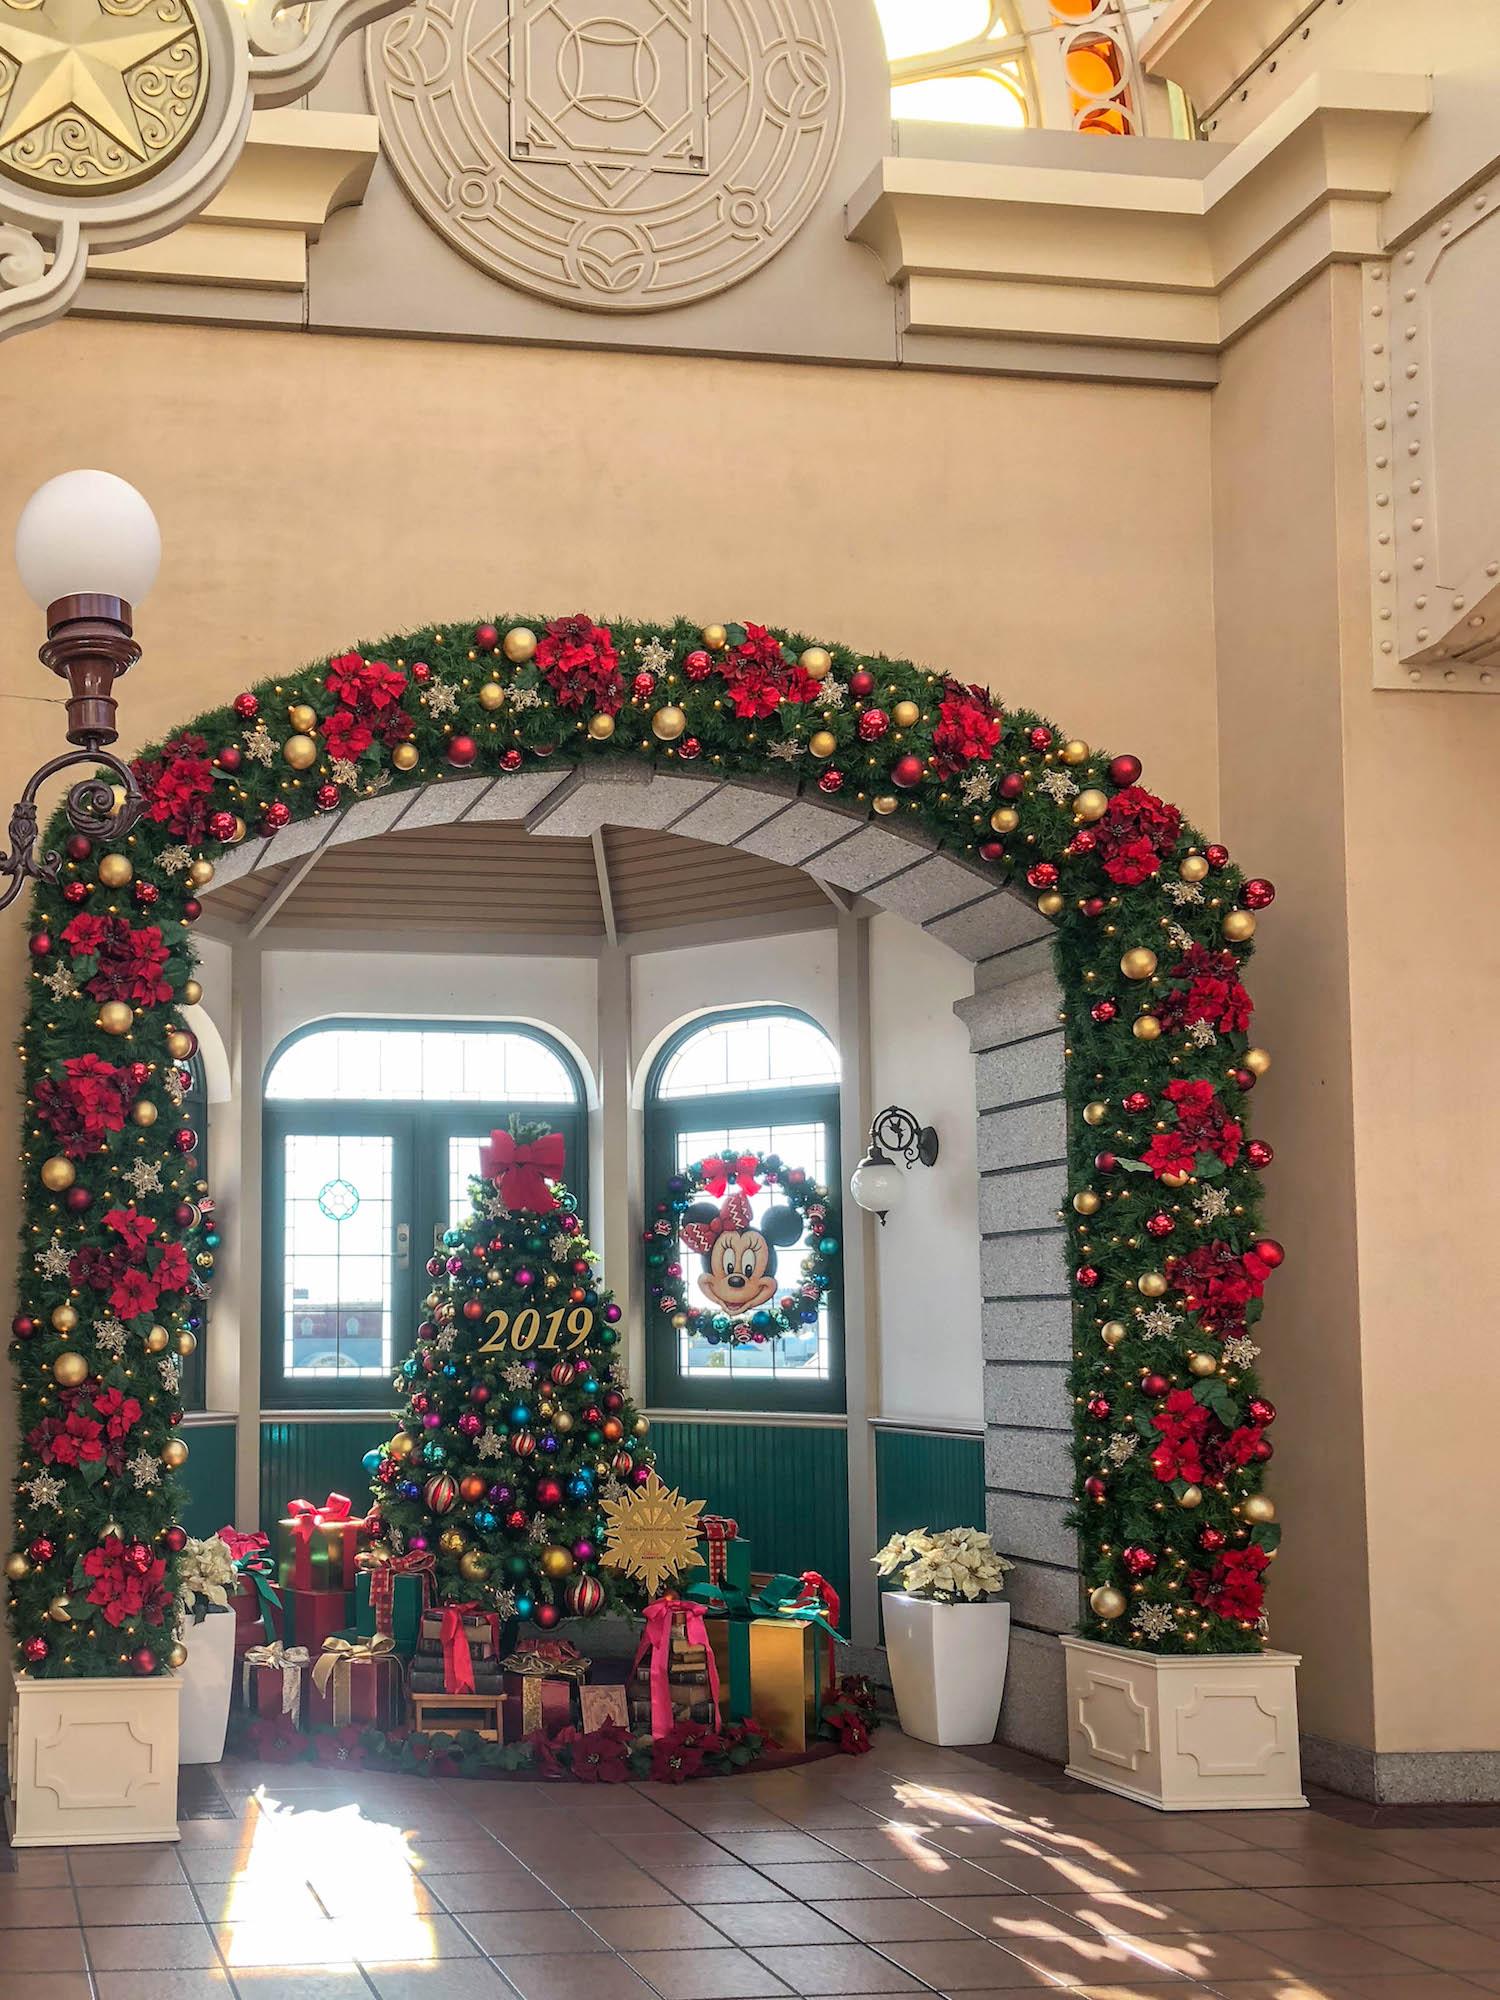 東京Disneyland station_聖誕樹